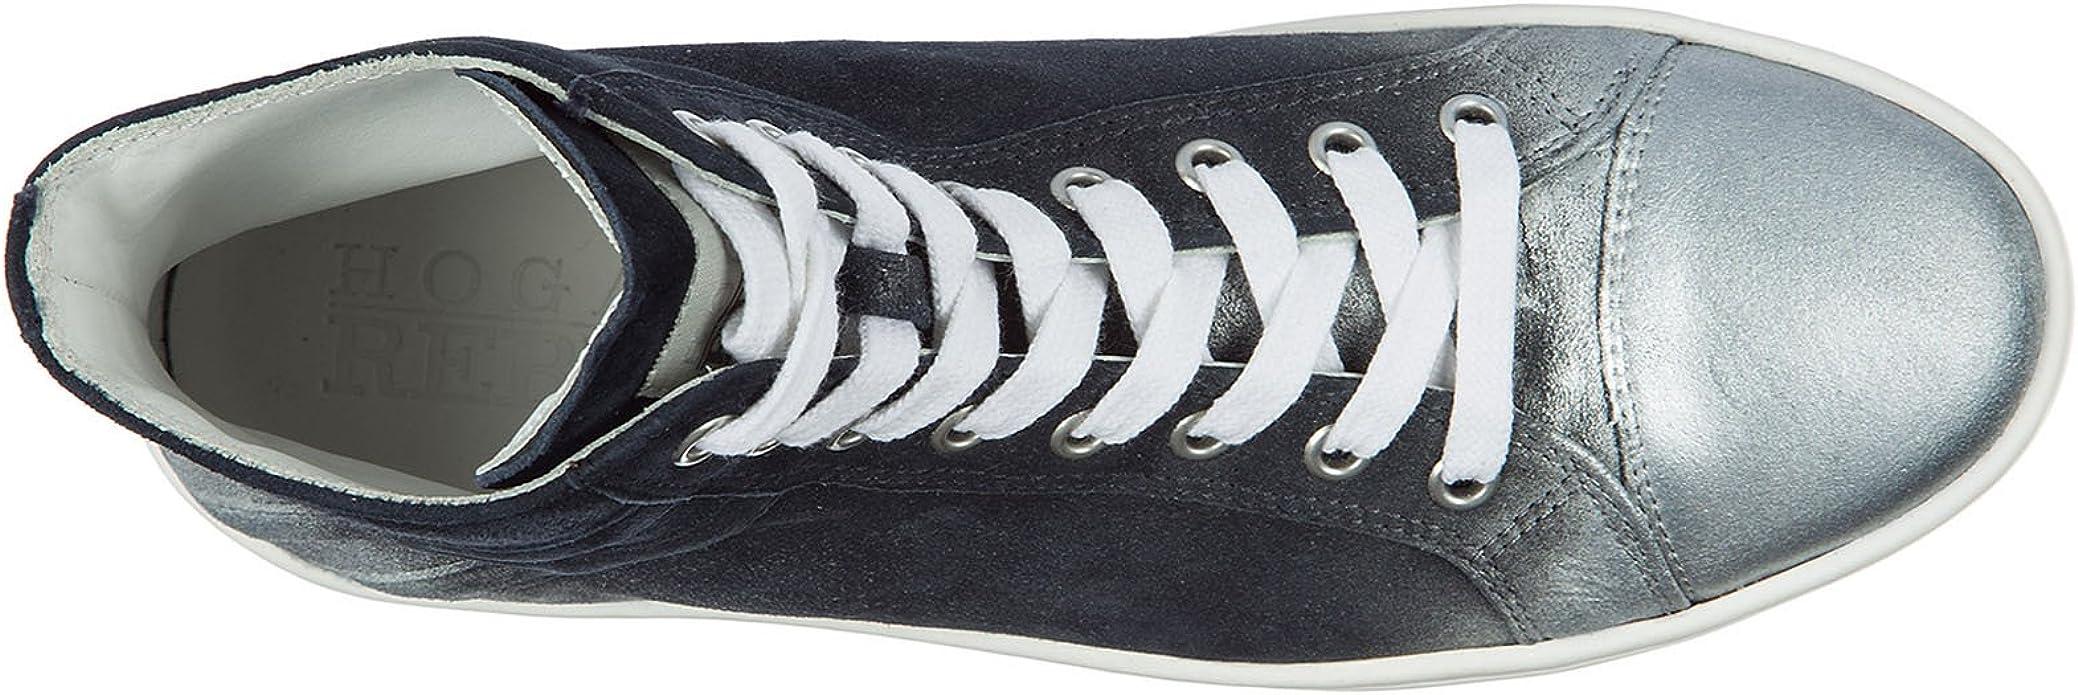 Hogan Rebel Sneakers Alte r141 Donna Blu 35 EU : Amazon.it: Moda